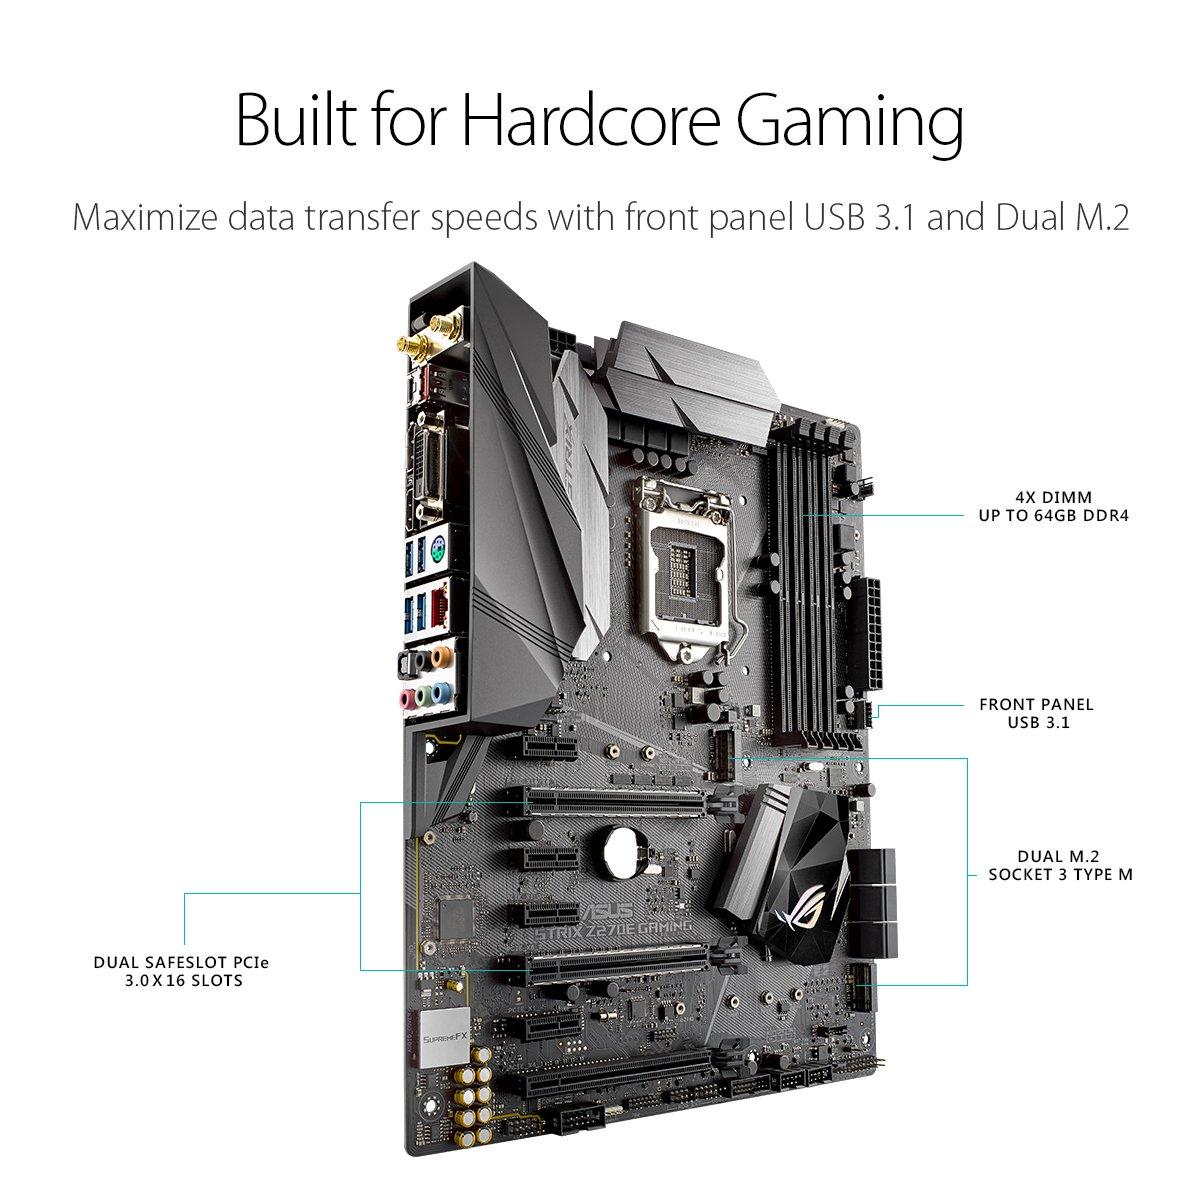 Amazon.com: ASUS ROG Strix Z270E Gaming LGA1151 DDR4 DP HDMI DVI M.2 ...